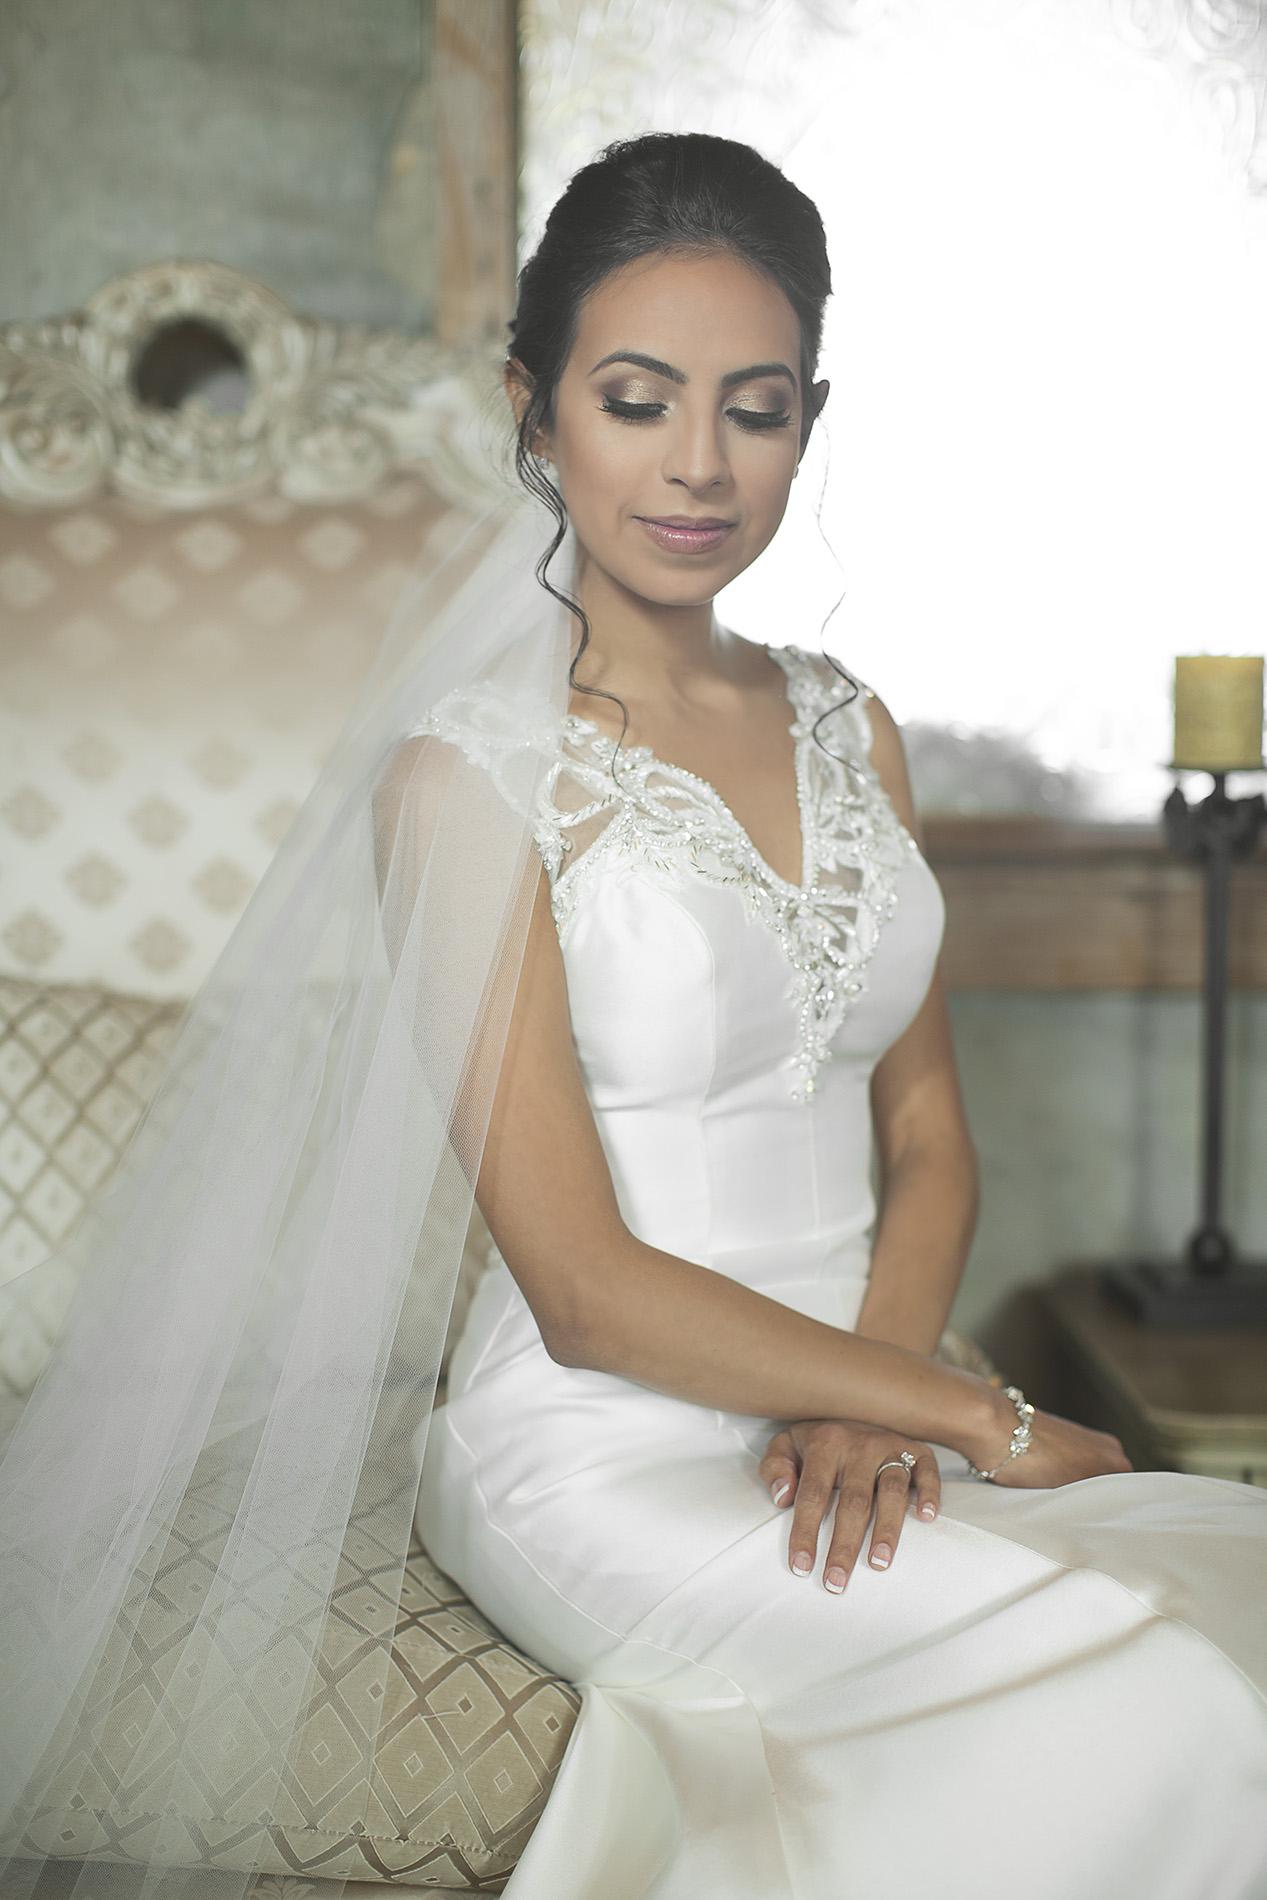 Houston-venue-Olde-Dobbin-Station-Romantic-Classic-Wedding-Photographer-016.jpg